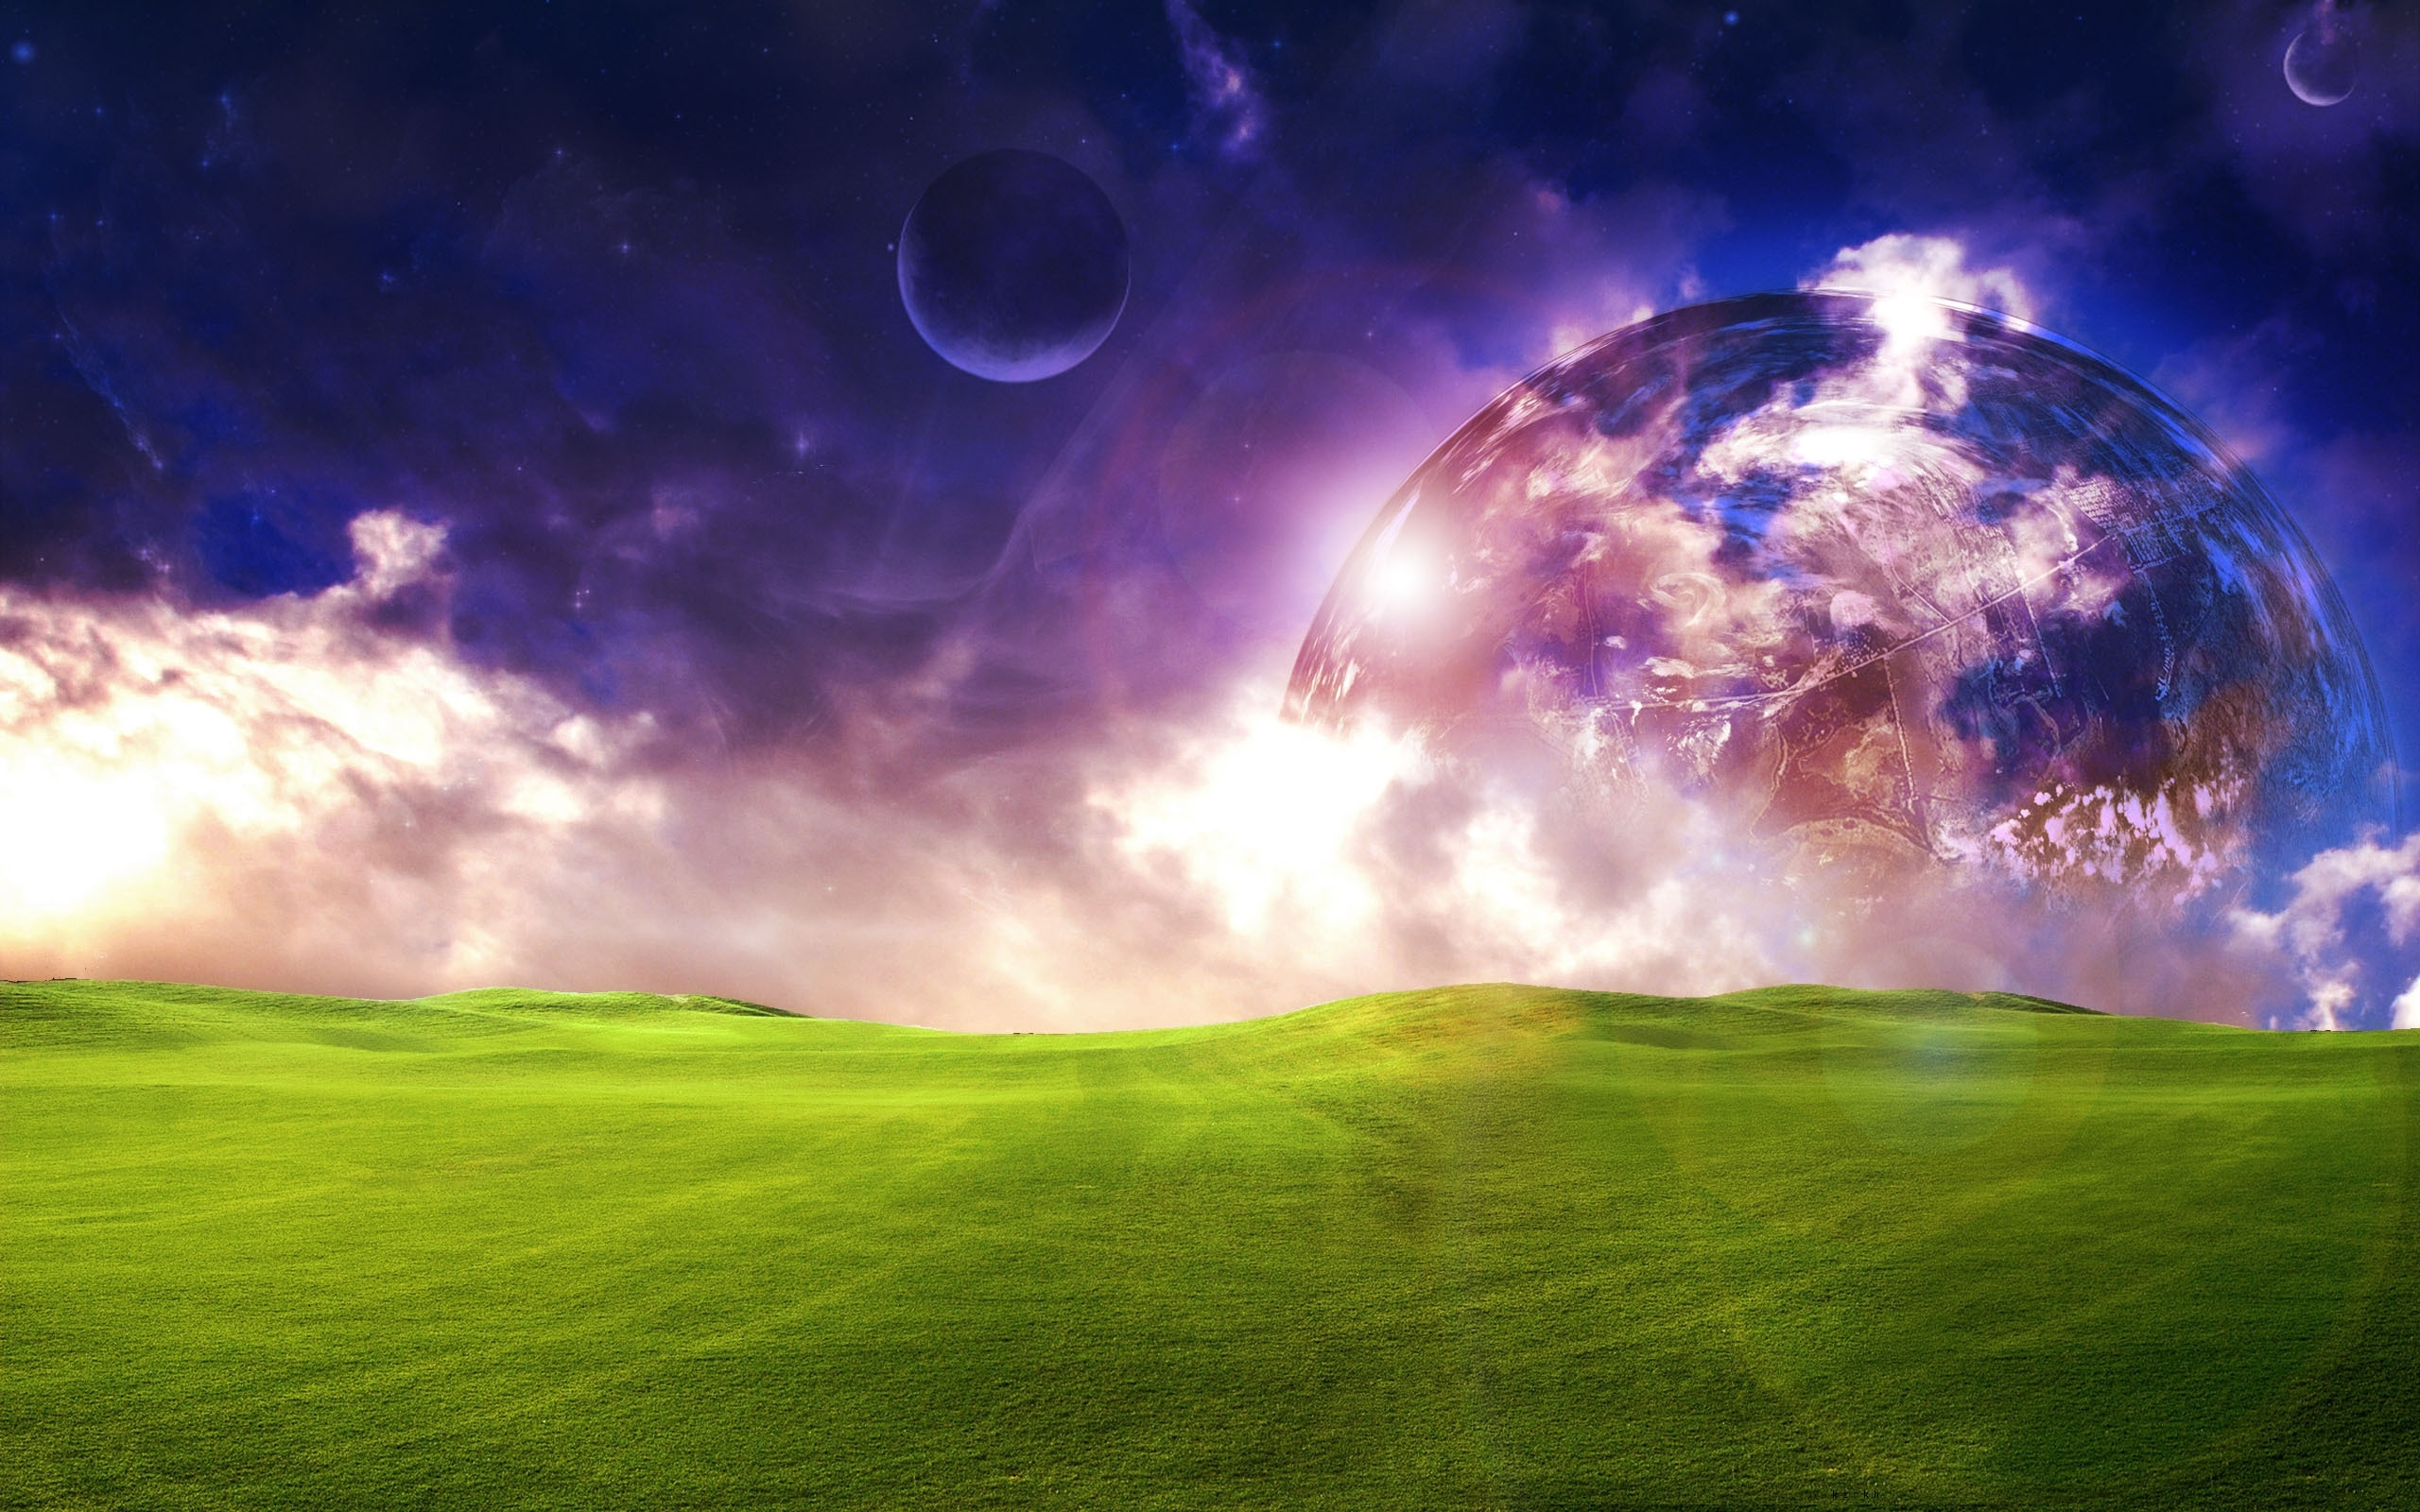 A Dreamy World Backgrounds, Compatible - PC, Mobile, Gadgets| 2560x1600 px